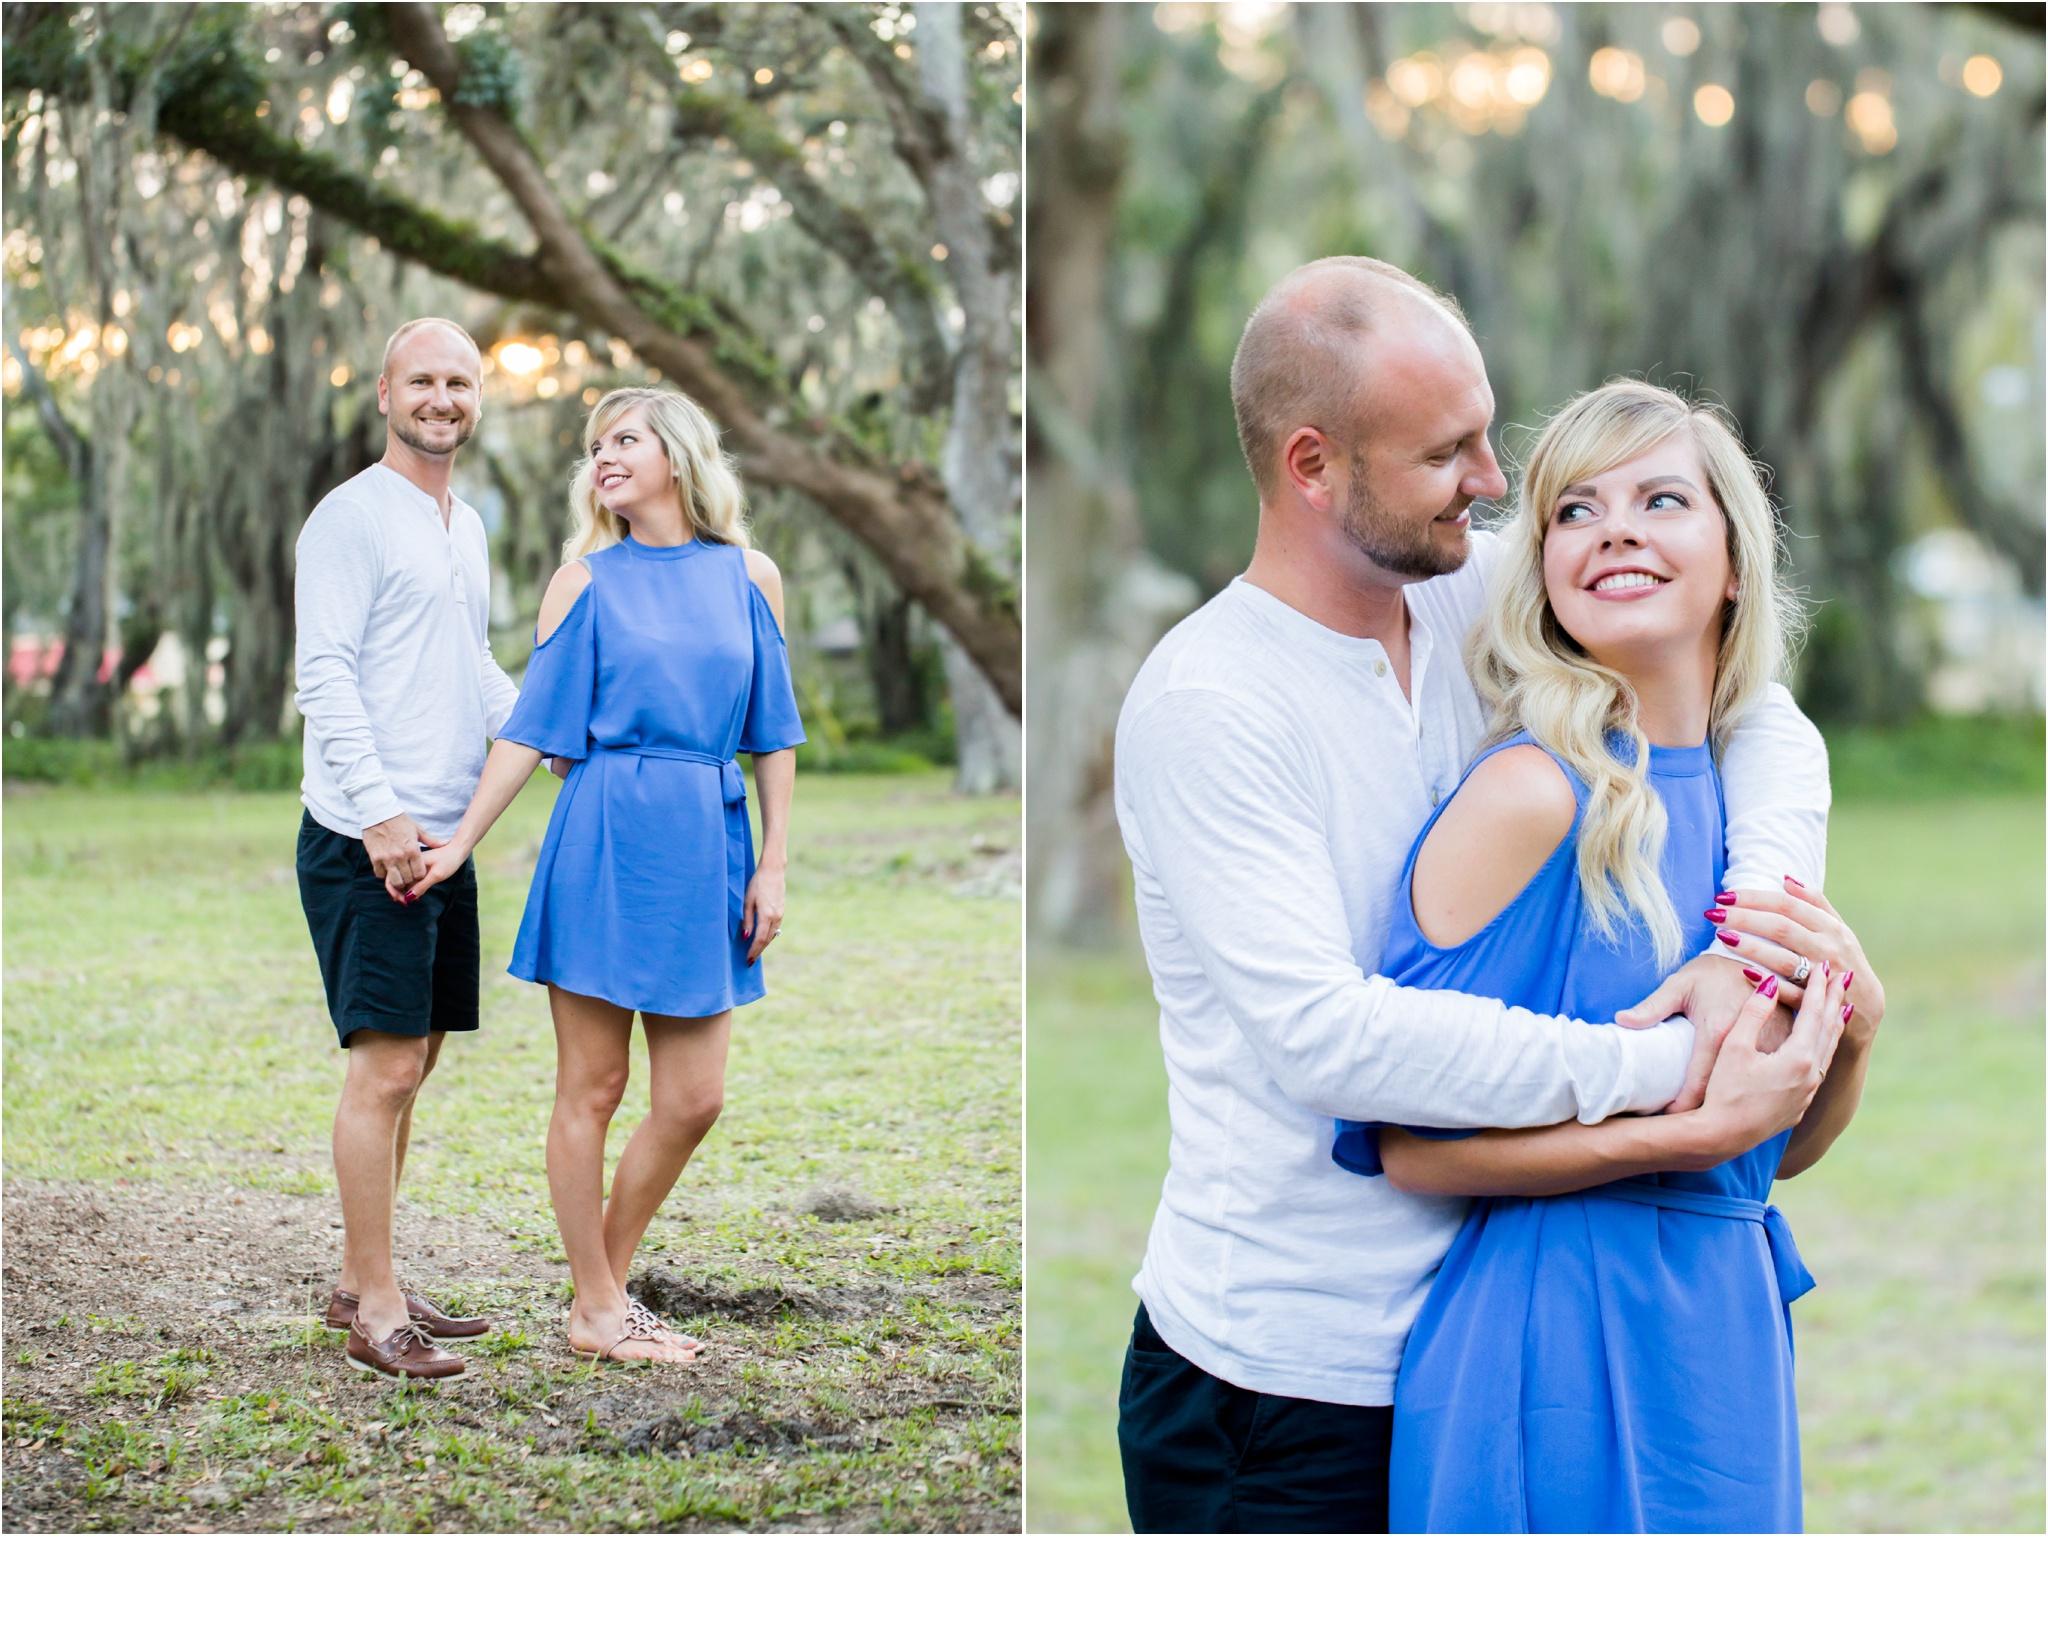 Rainey_Gregg_Photography_St._Simons_Island_Georgia_California_Wedding_Portrait_Photography_0261.jpg